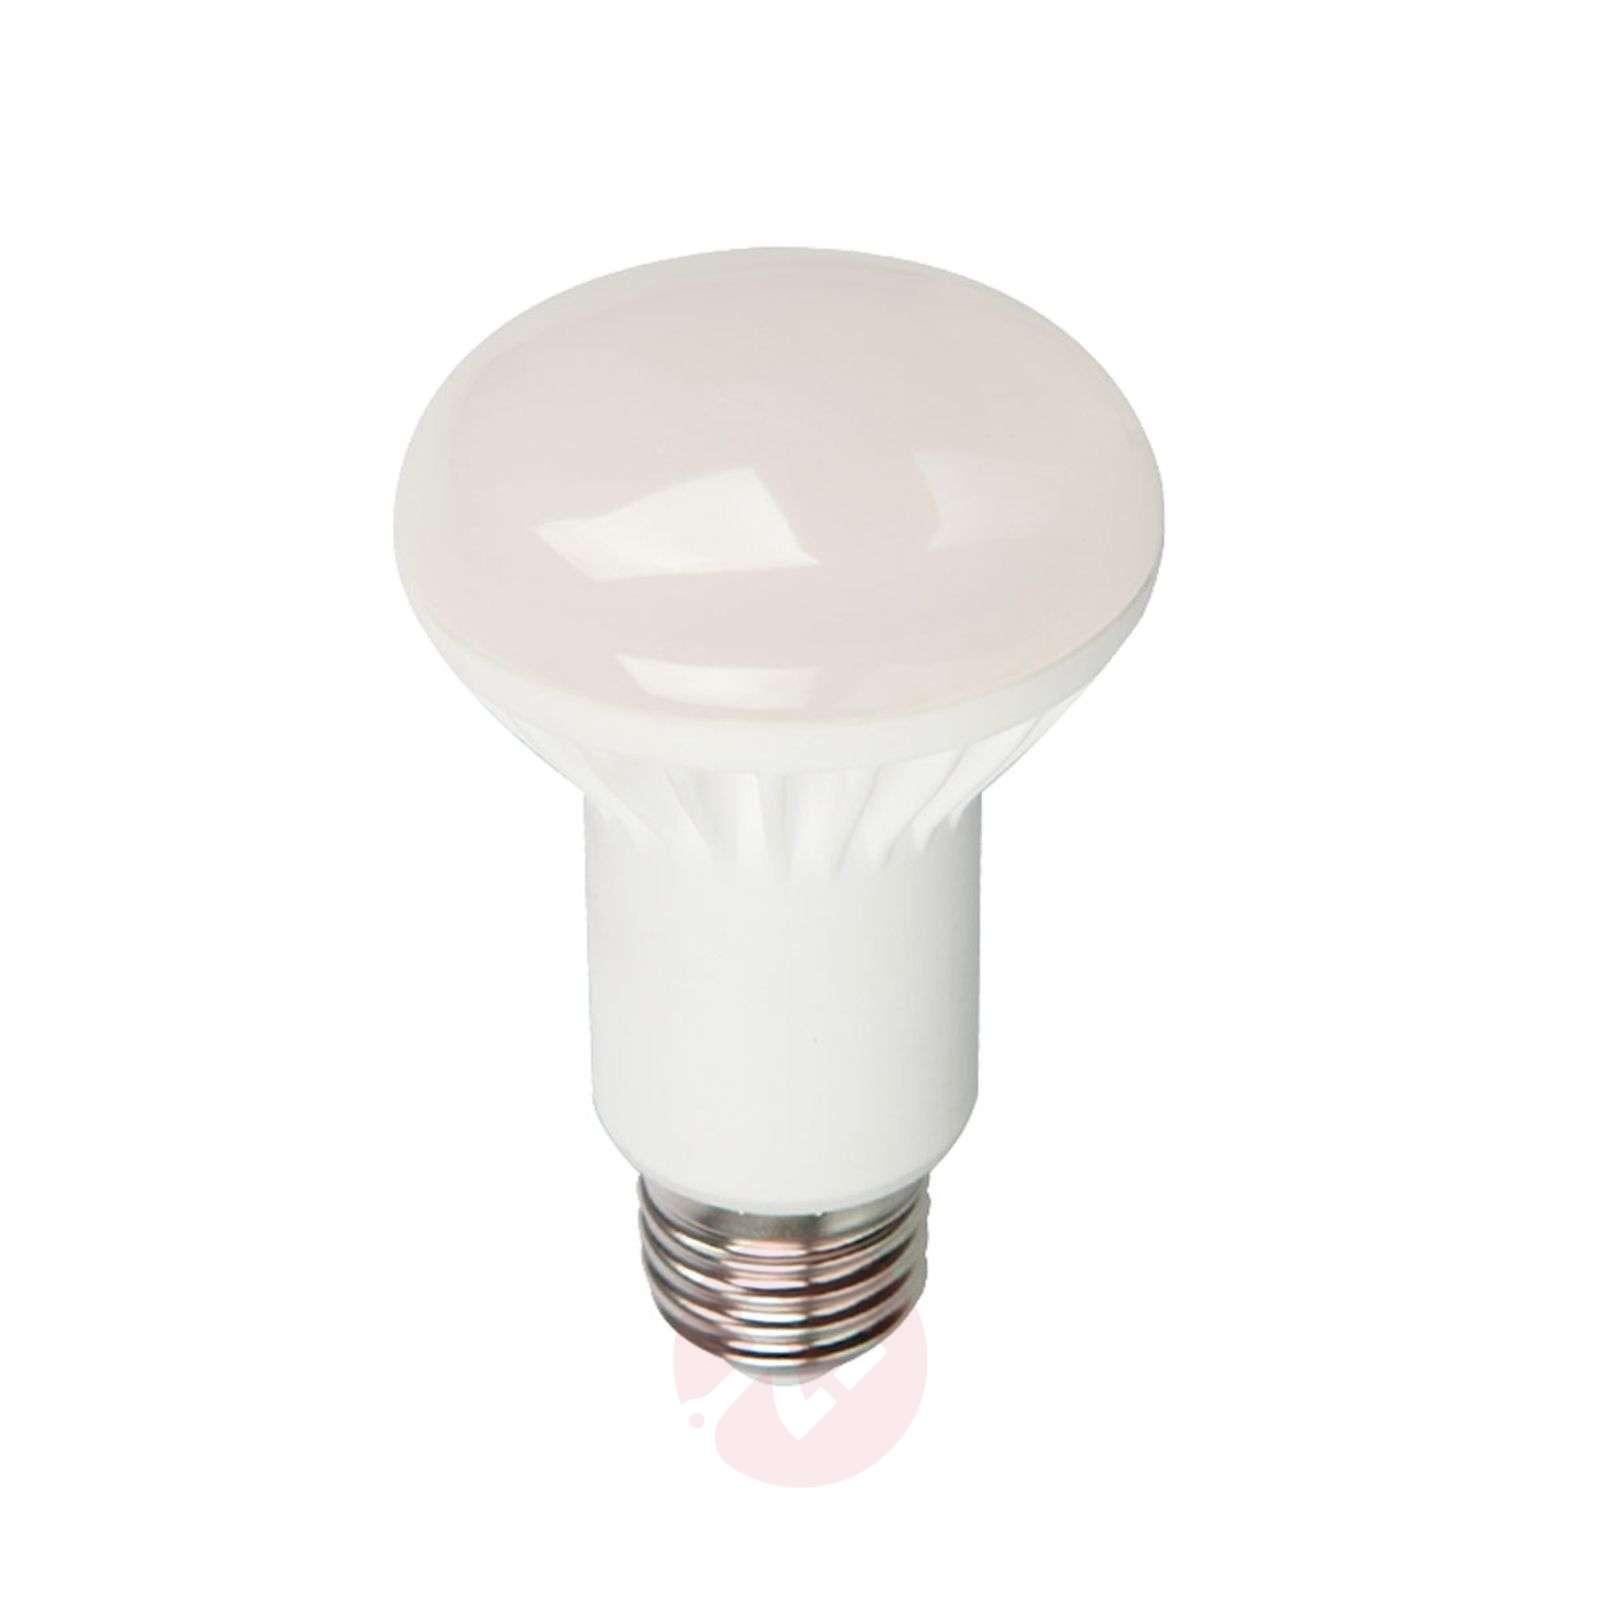 E27 7,5W 827 LED-heijastinlamppu Roder R63-2515031-01